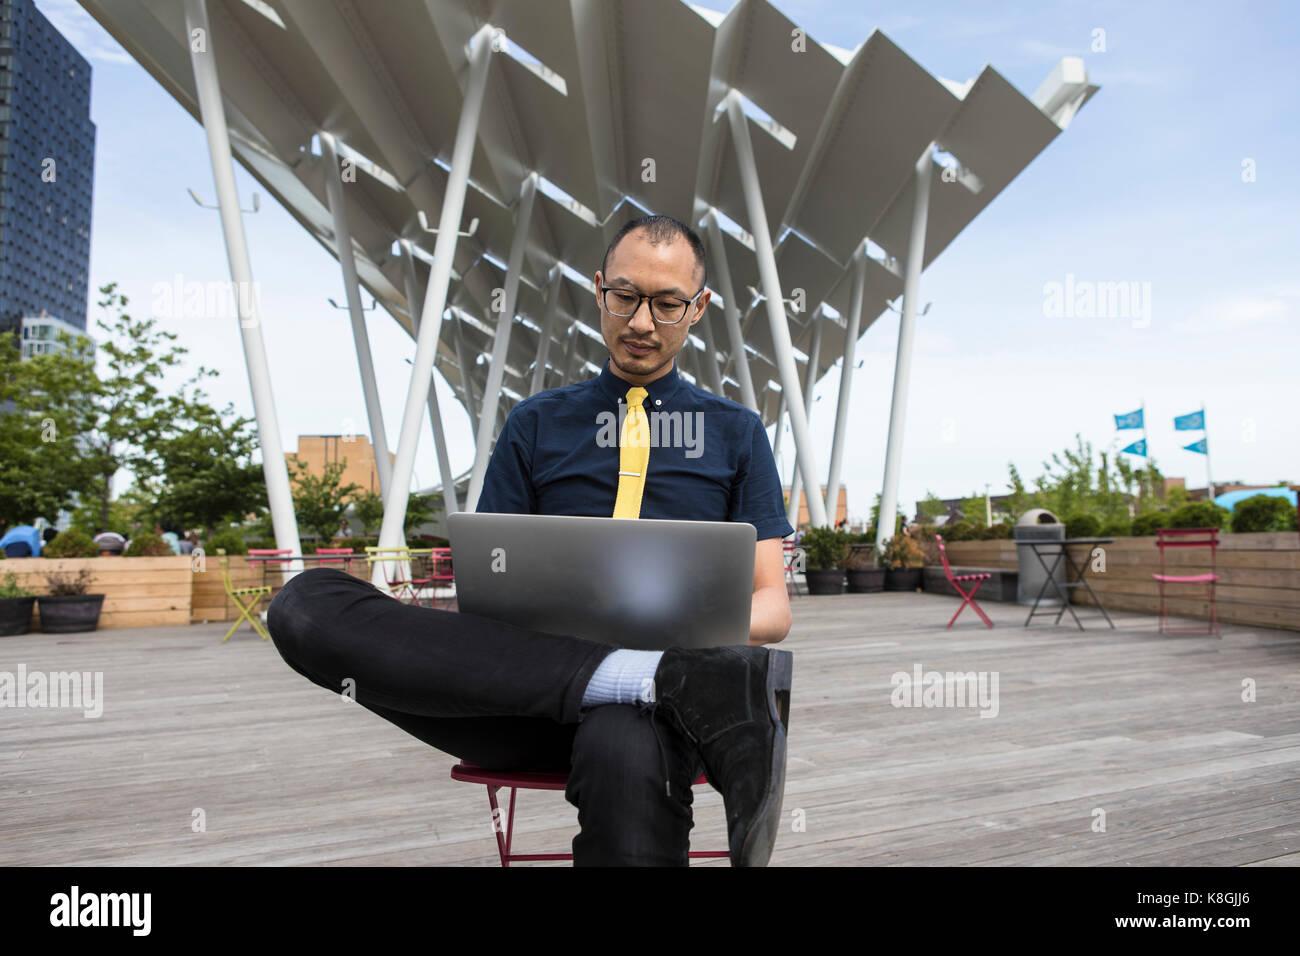 Businessman using laptop outside hotel, New York, USA - Stock Image